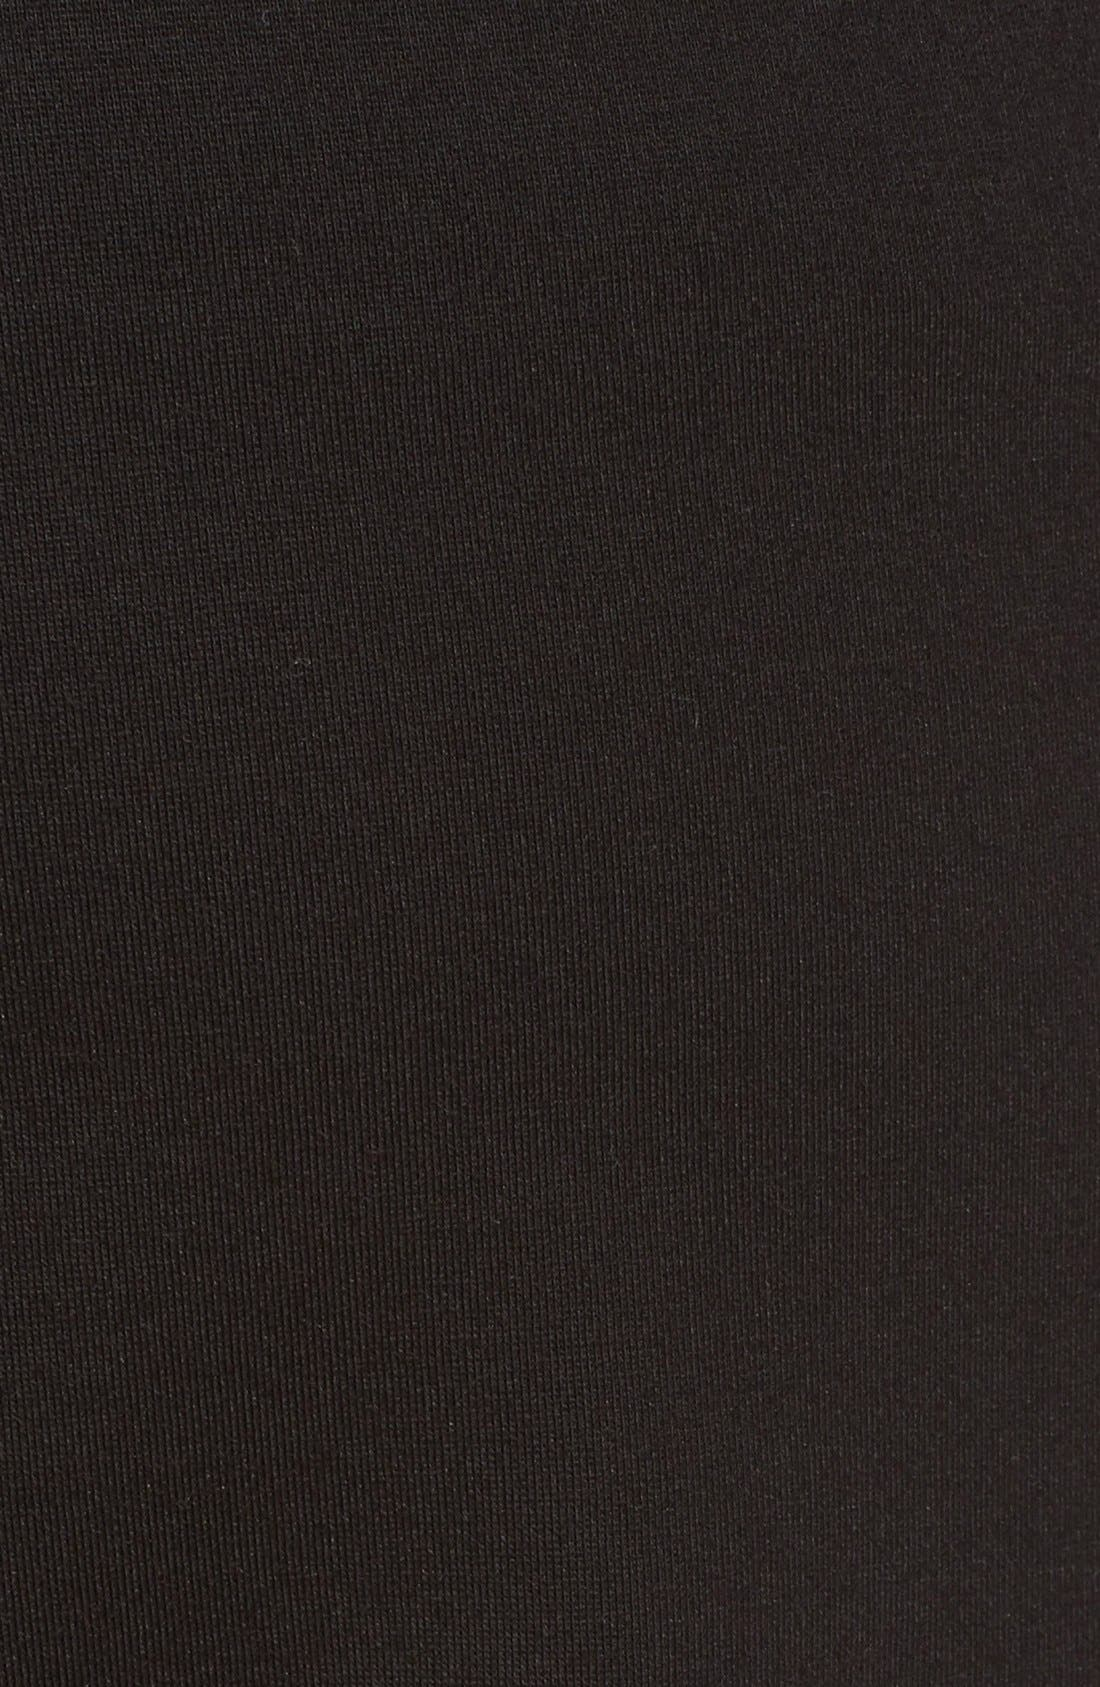 Slim Crop Pants,                             Alternate thumbnail 5, color,                             Black